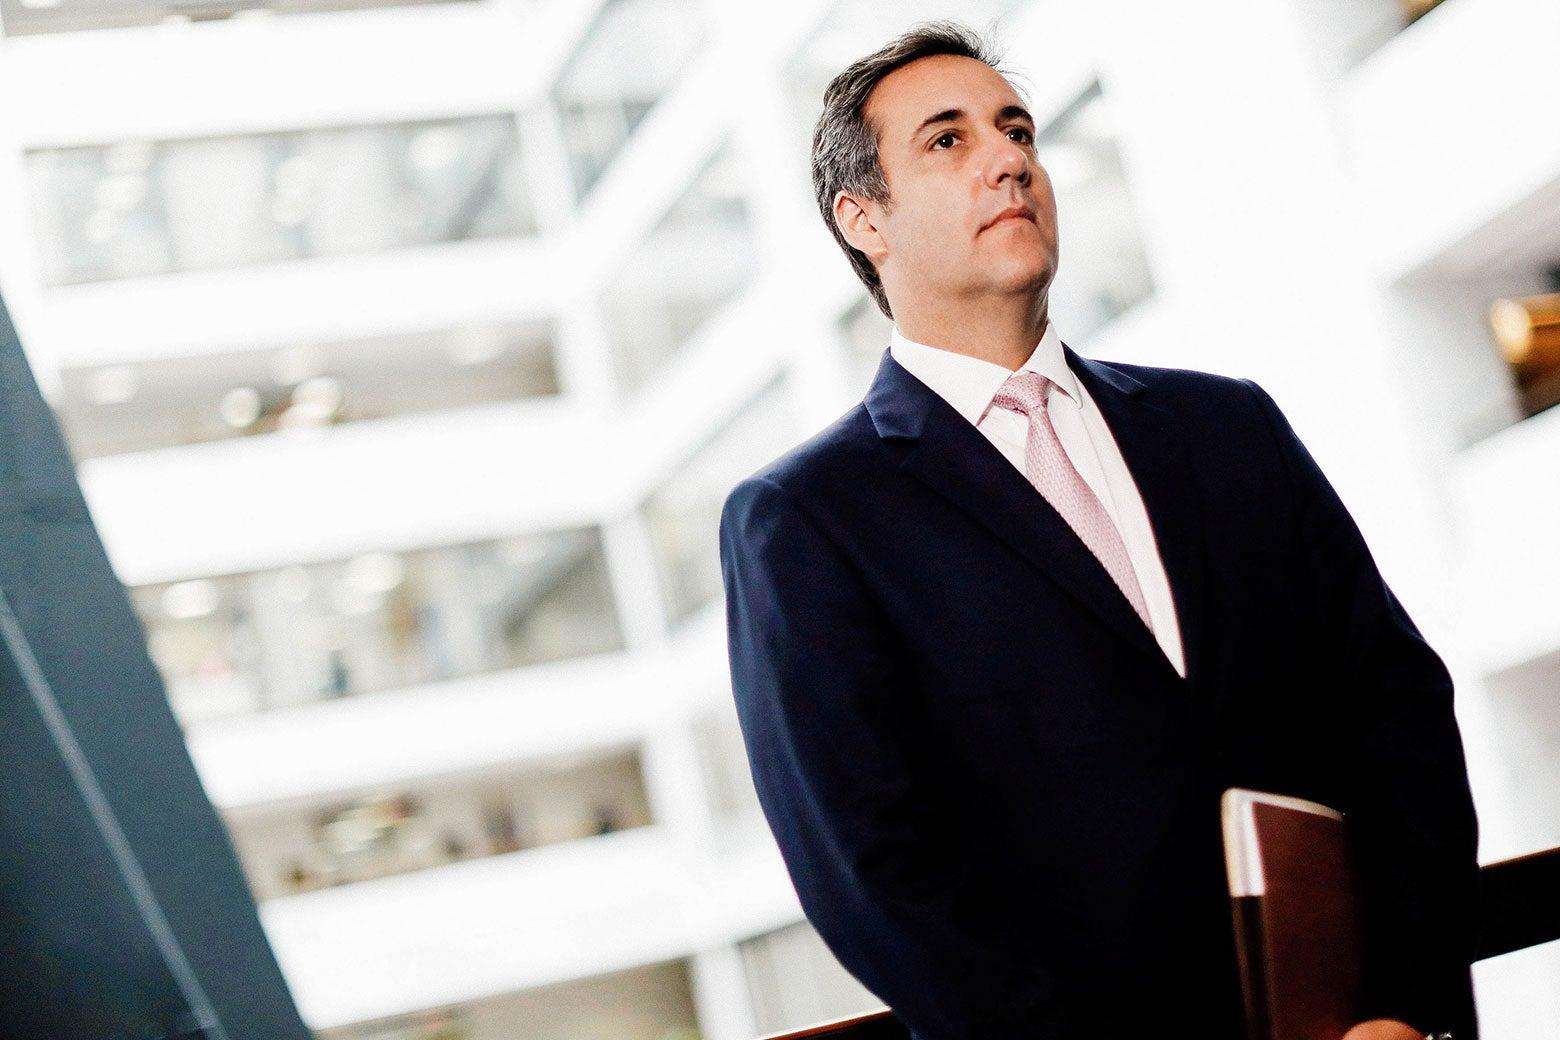 Michael Cohen in a Senate office building.